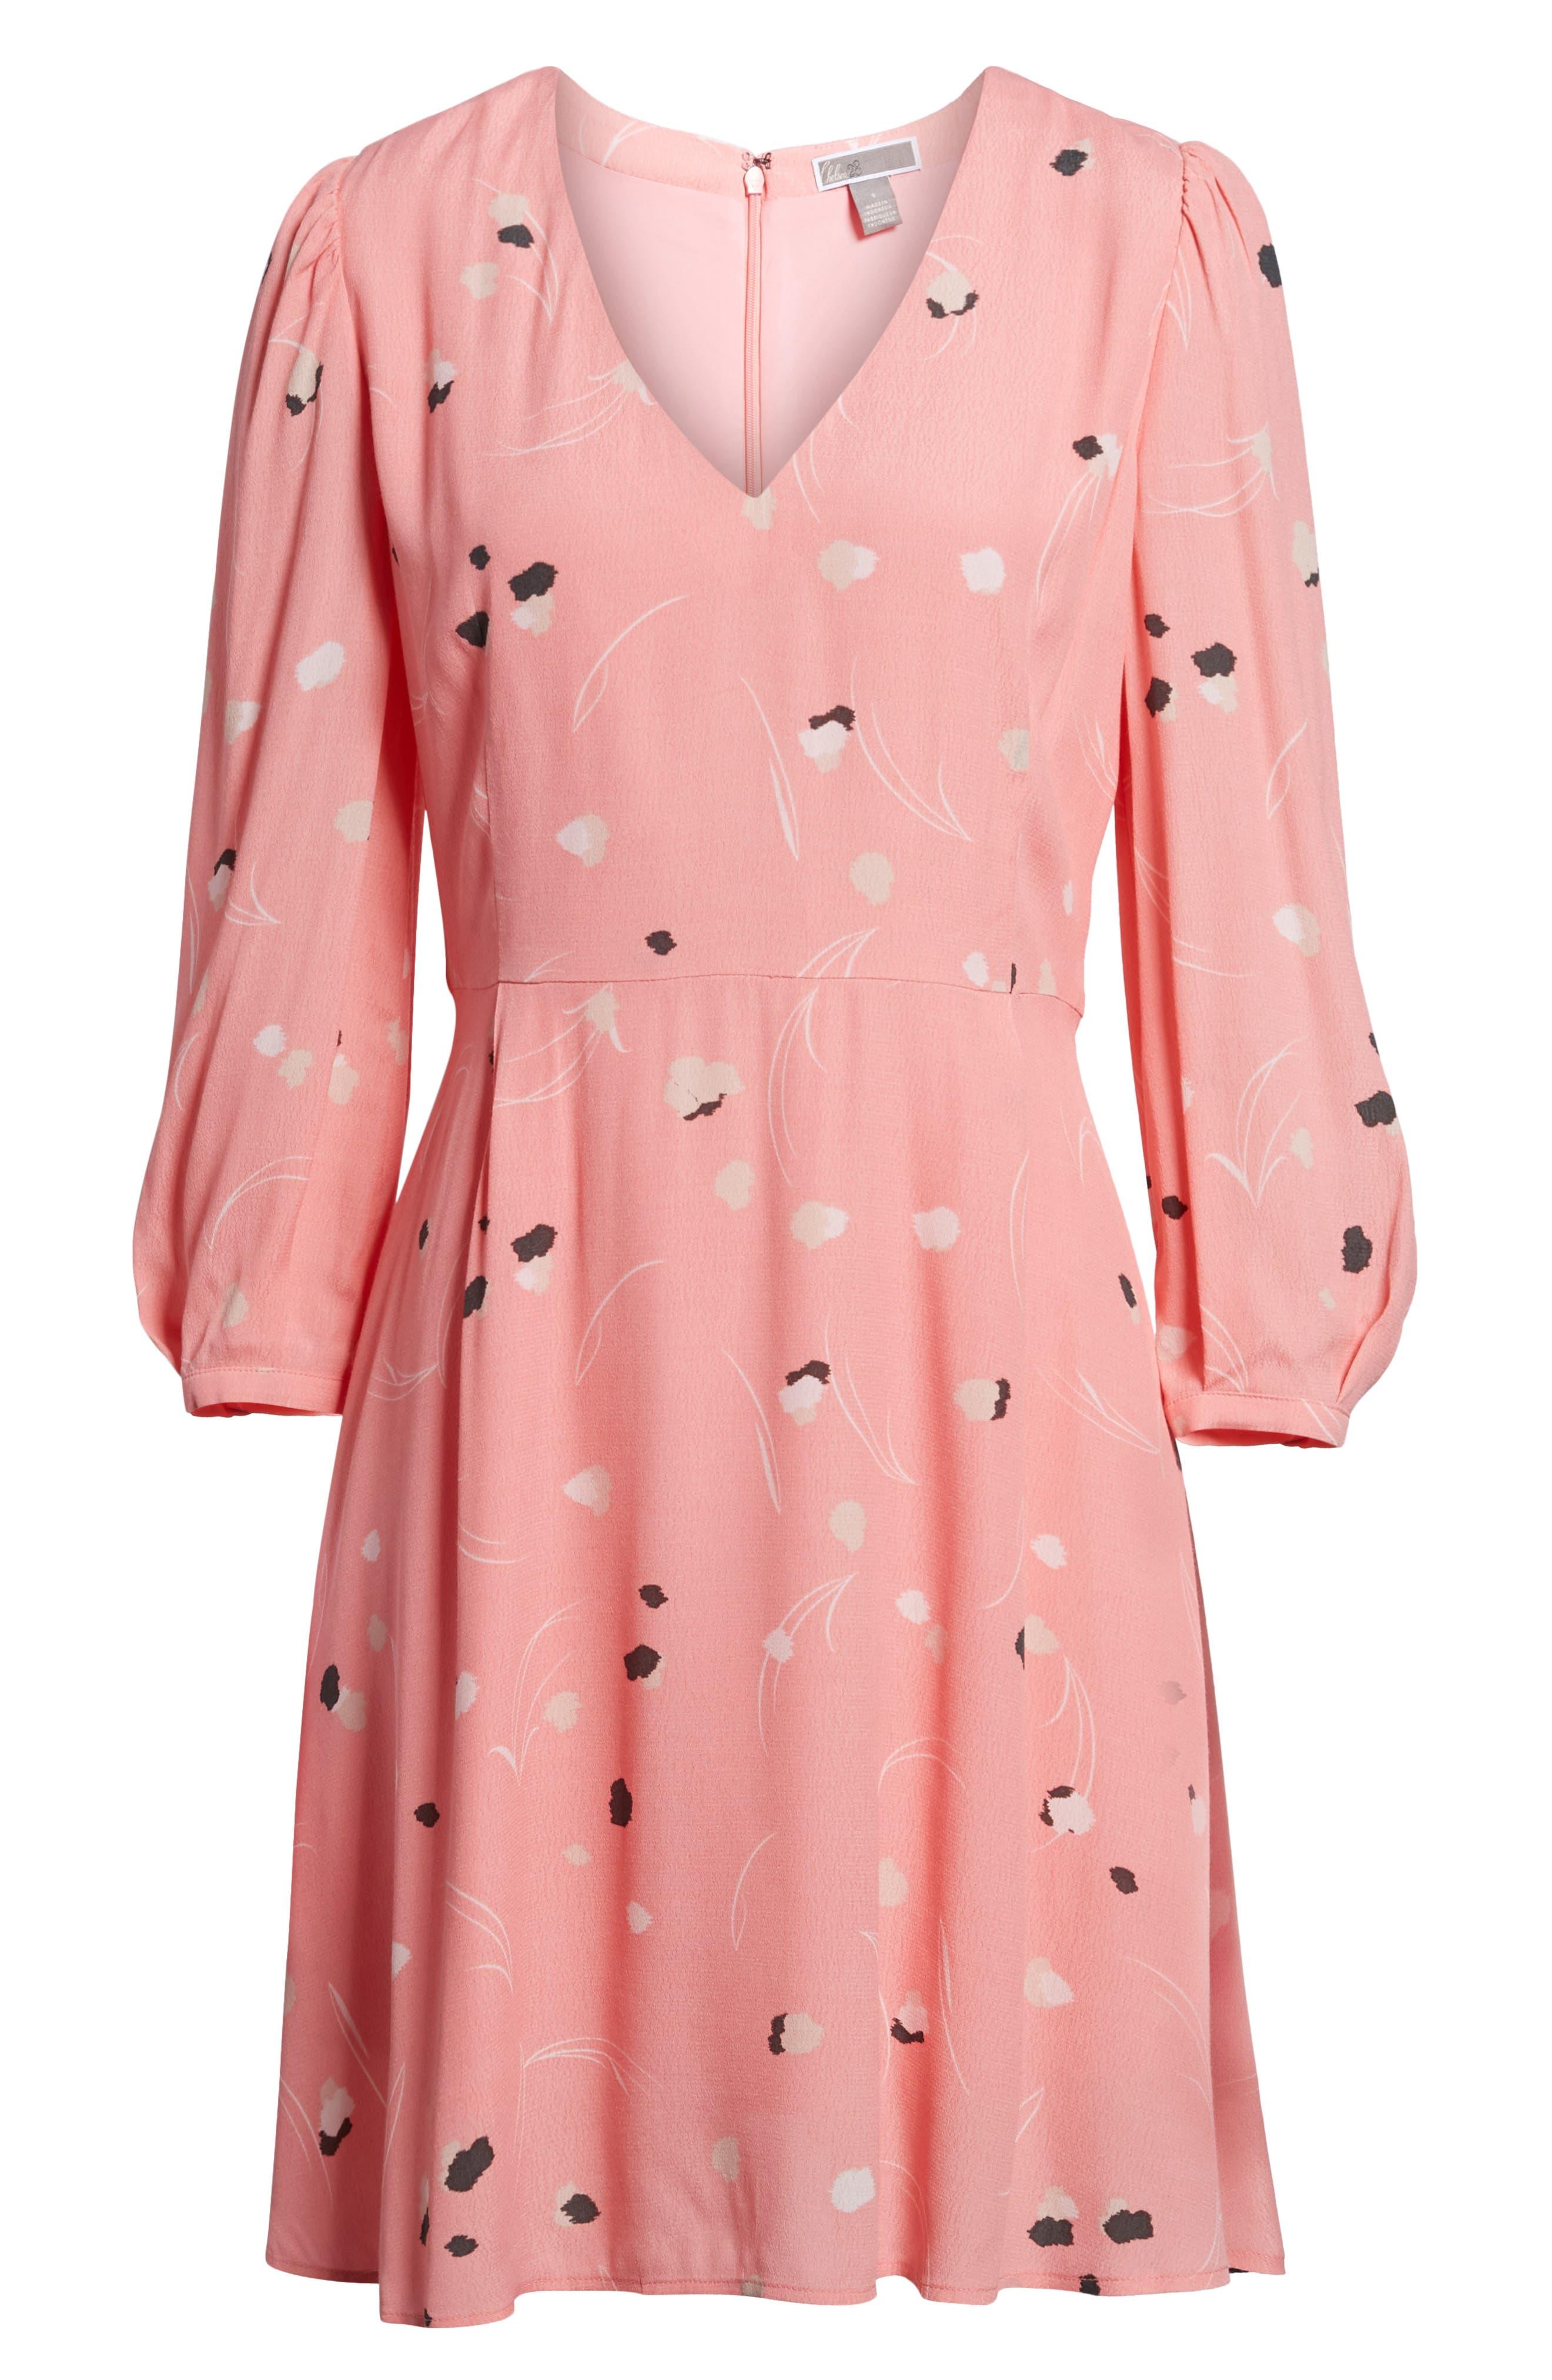 V-Neck Puff Sleeve Dress,                             Alternate thumbnail 6, color,                             Pink Flamingo Mini Pops